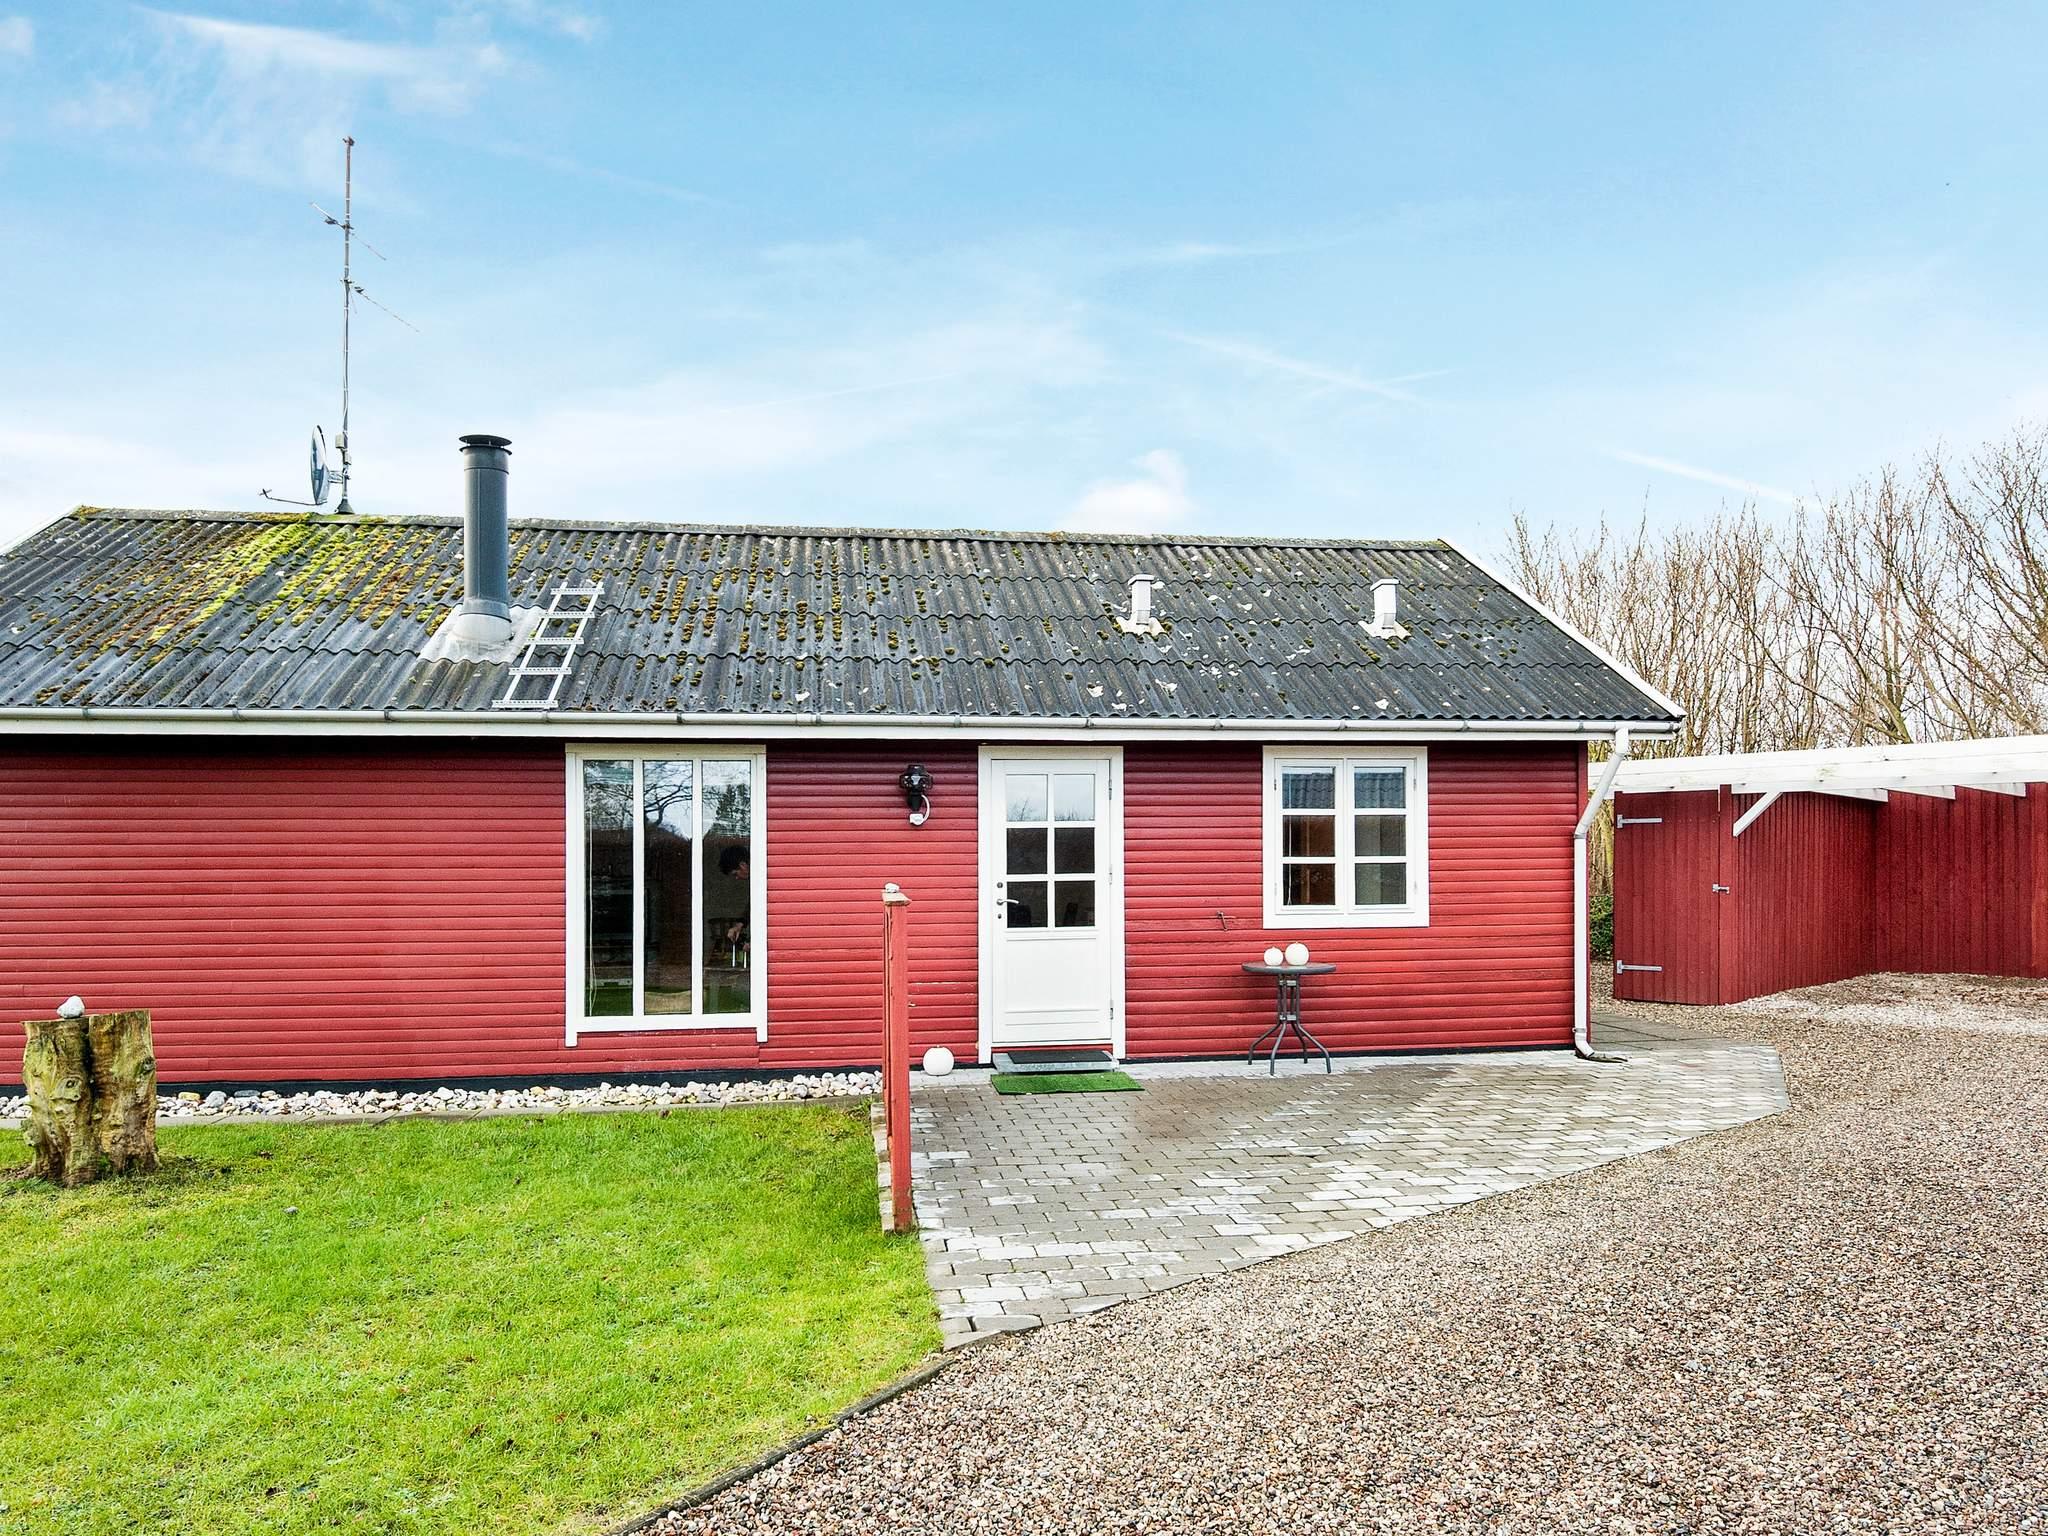 Ferienhaus Skovmose/Als (82561), Skovby, , Südostjütland, Dänemark, Bild 21